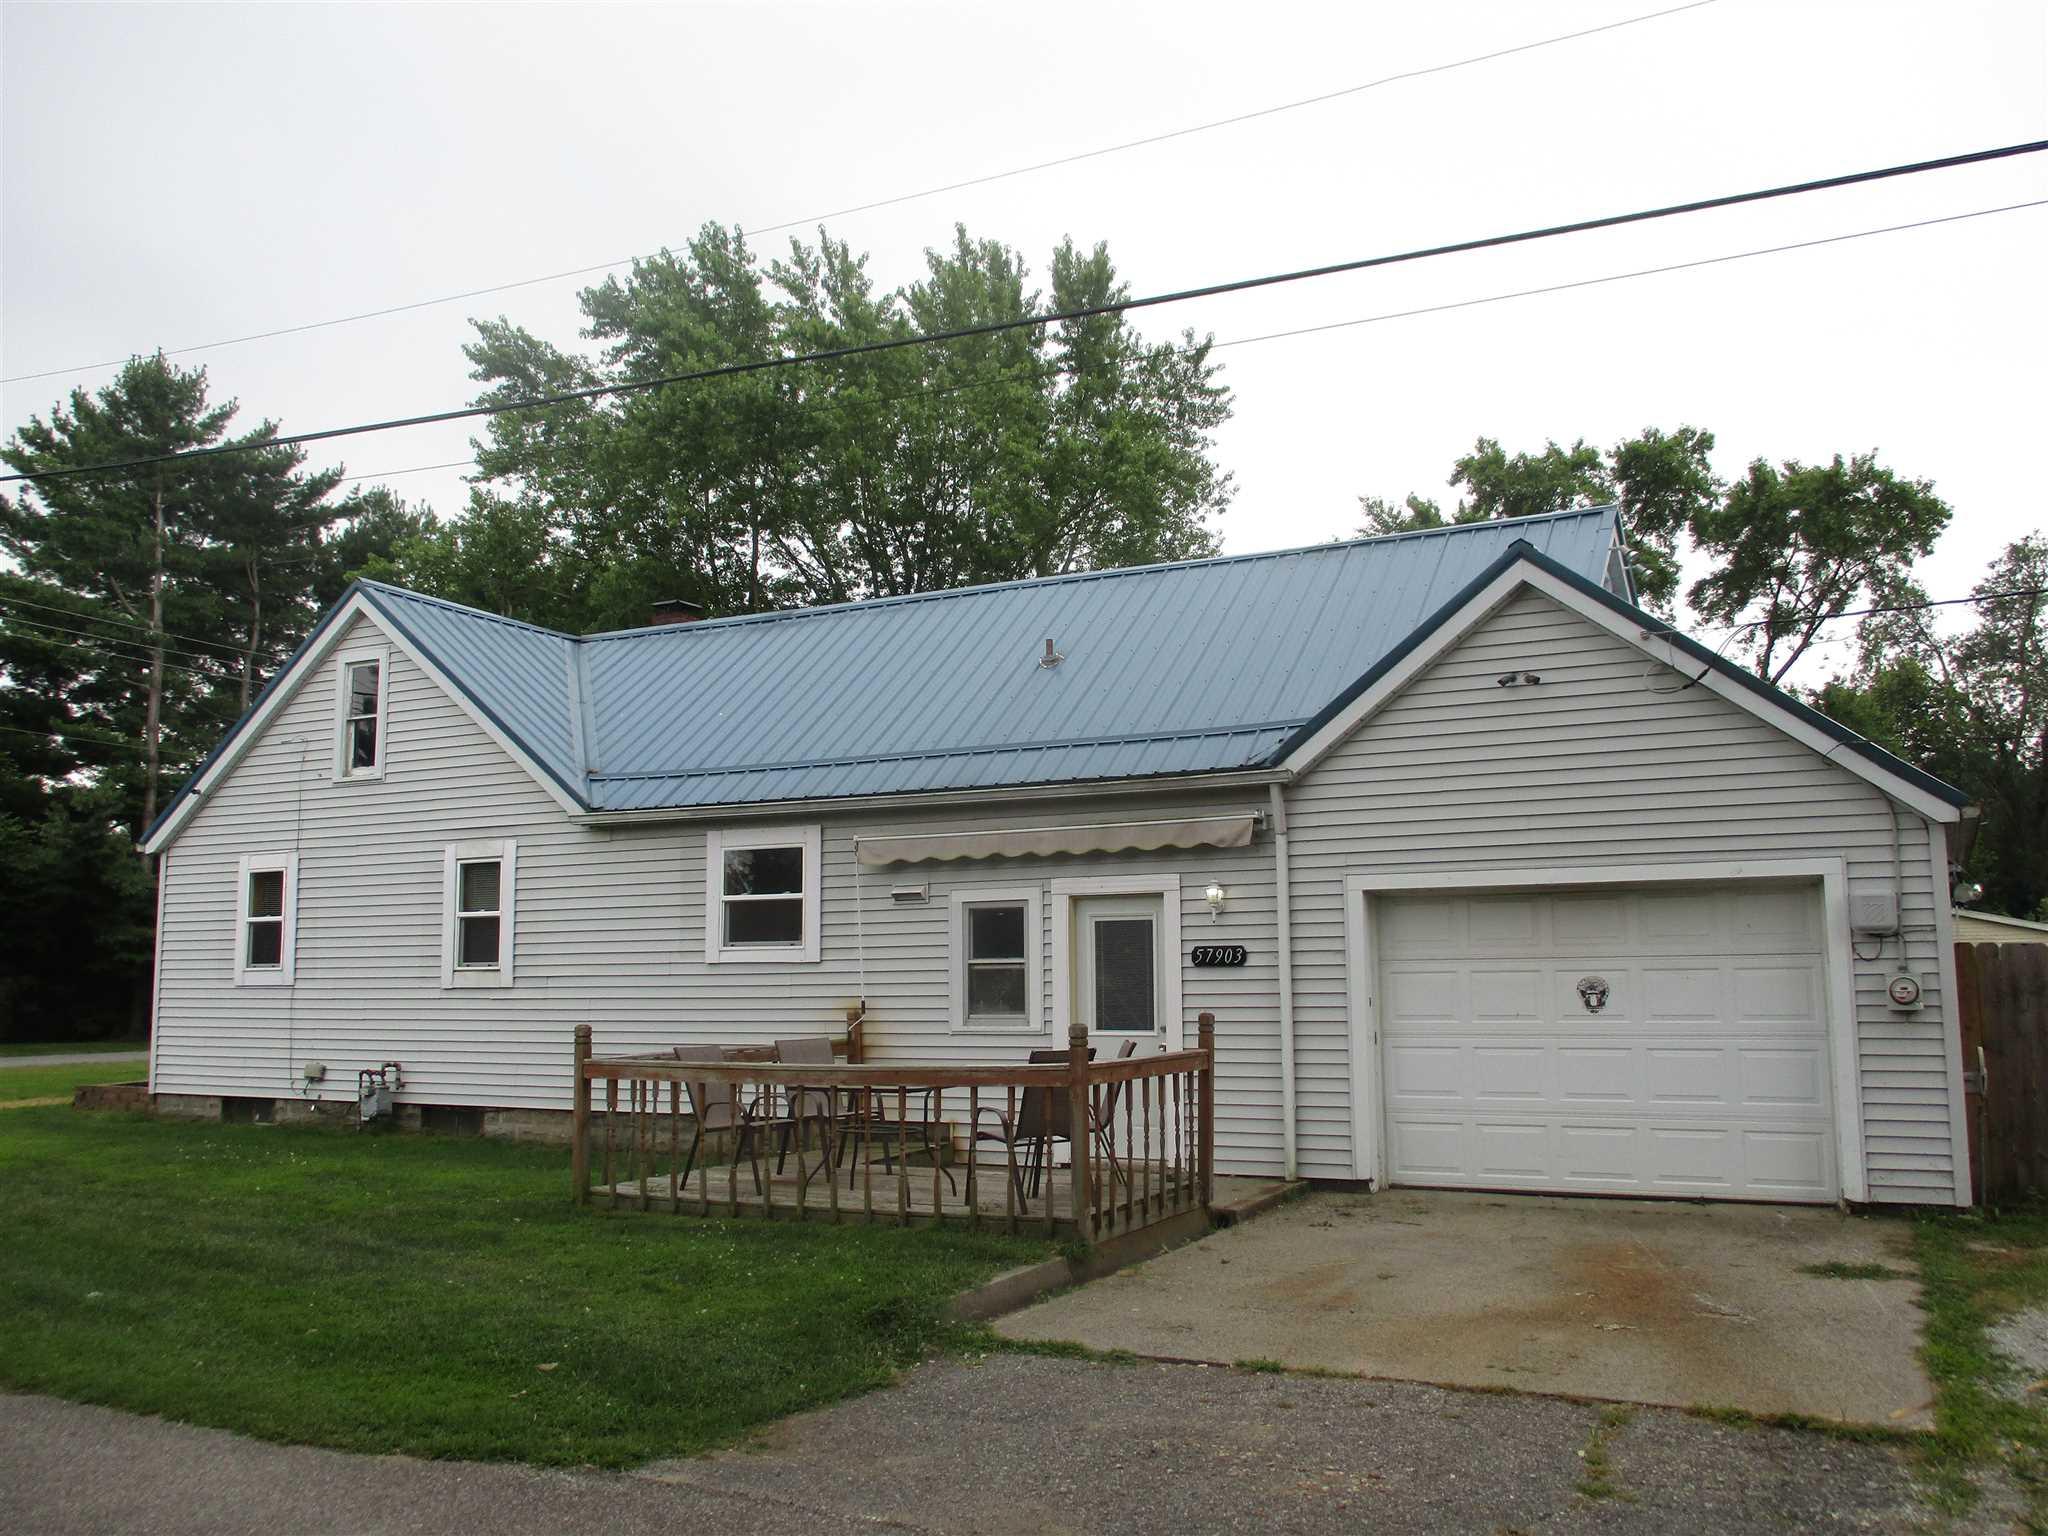 57903 County Road 13 Elkhart, IN 46516